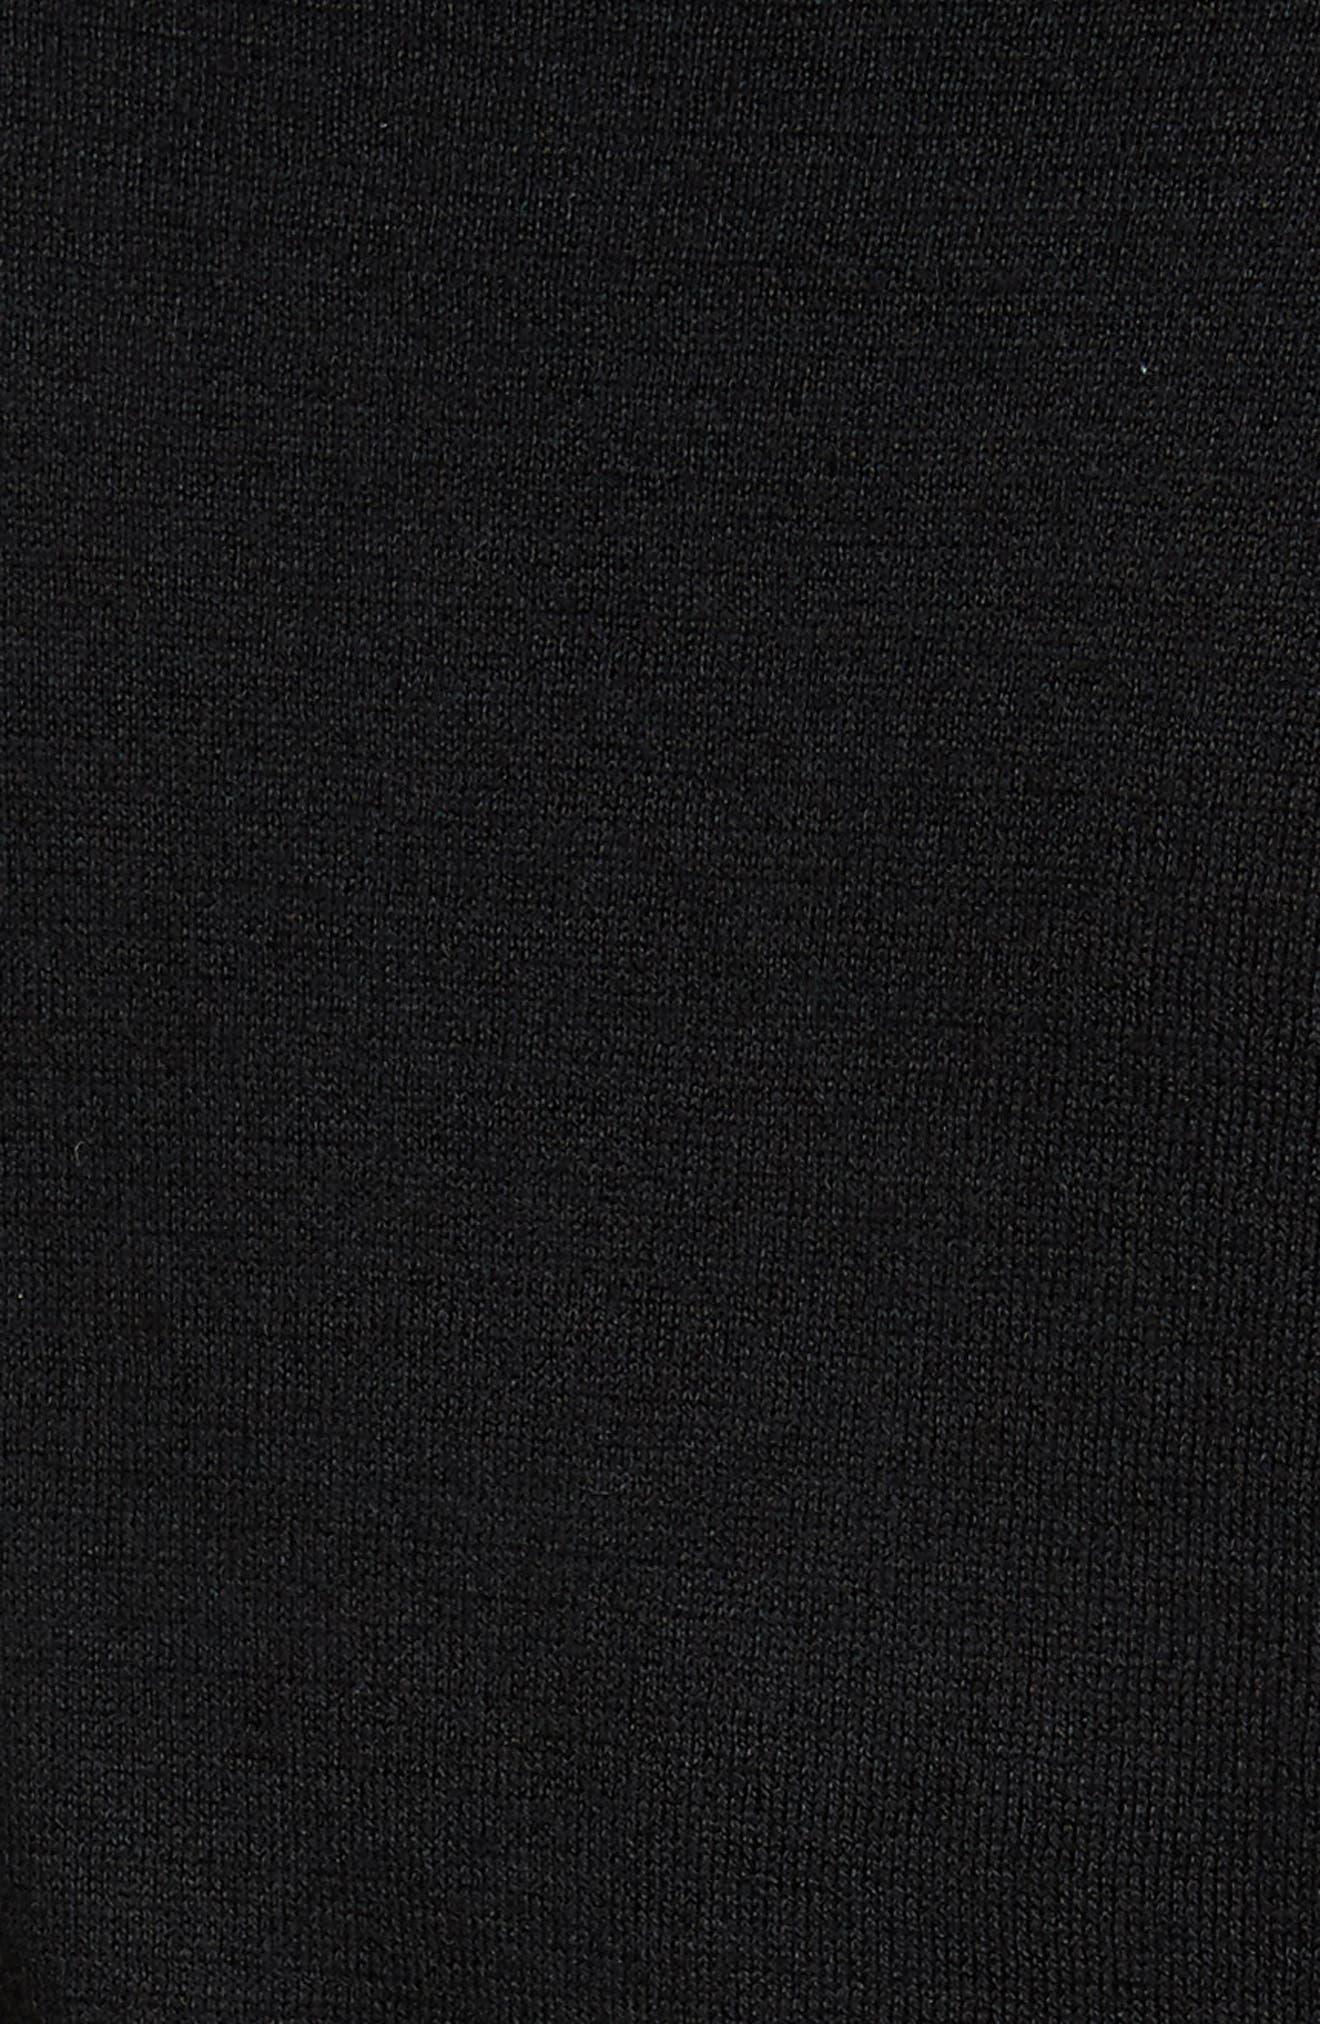 Cotton Blend V-Neck Sweater,                             Alternate thumbnail 6, color,                             001